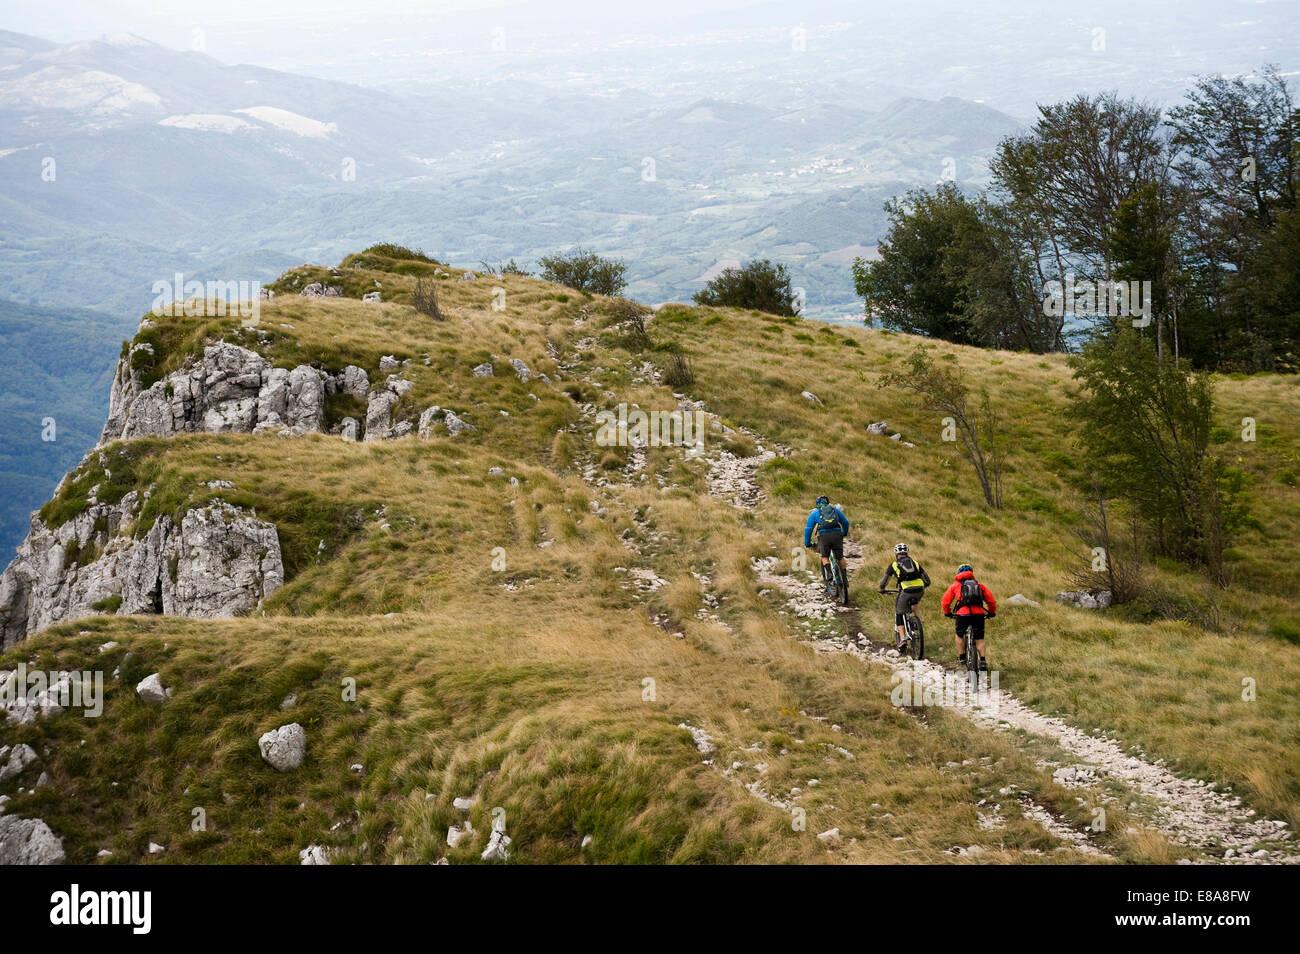 three mountain bikers on the way, Vipava valley, Istria, Nanos, Slovenia - Stock Image